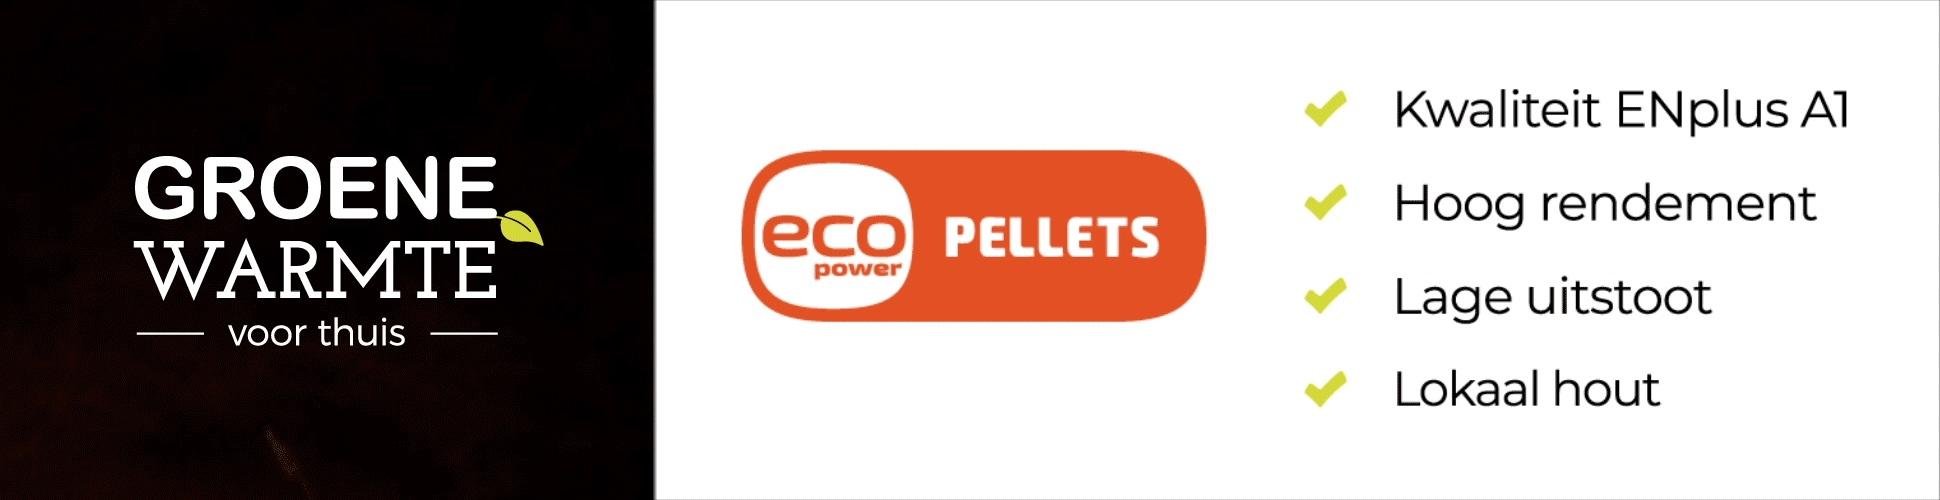 2018 Ecopower_Pellets_Banner_Website